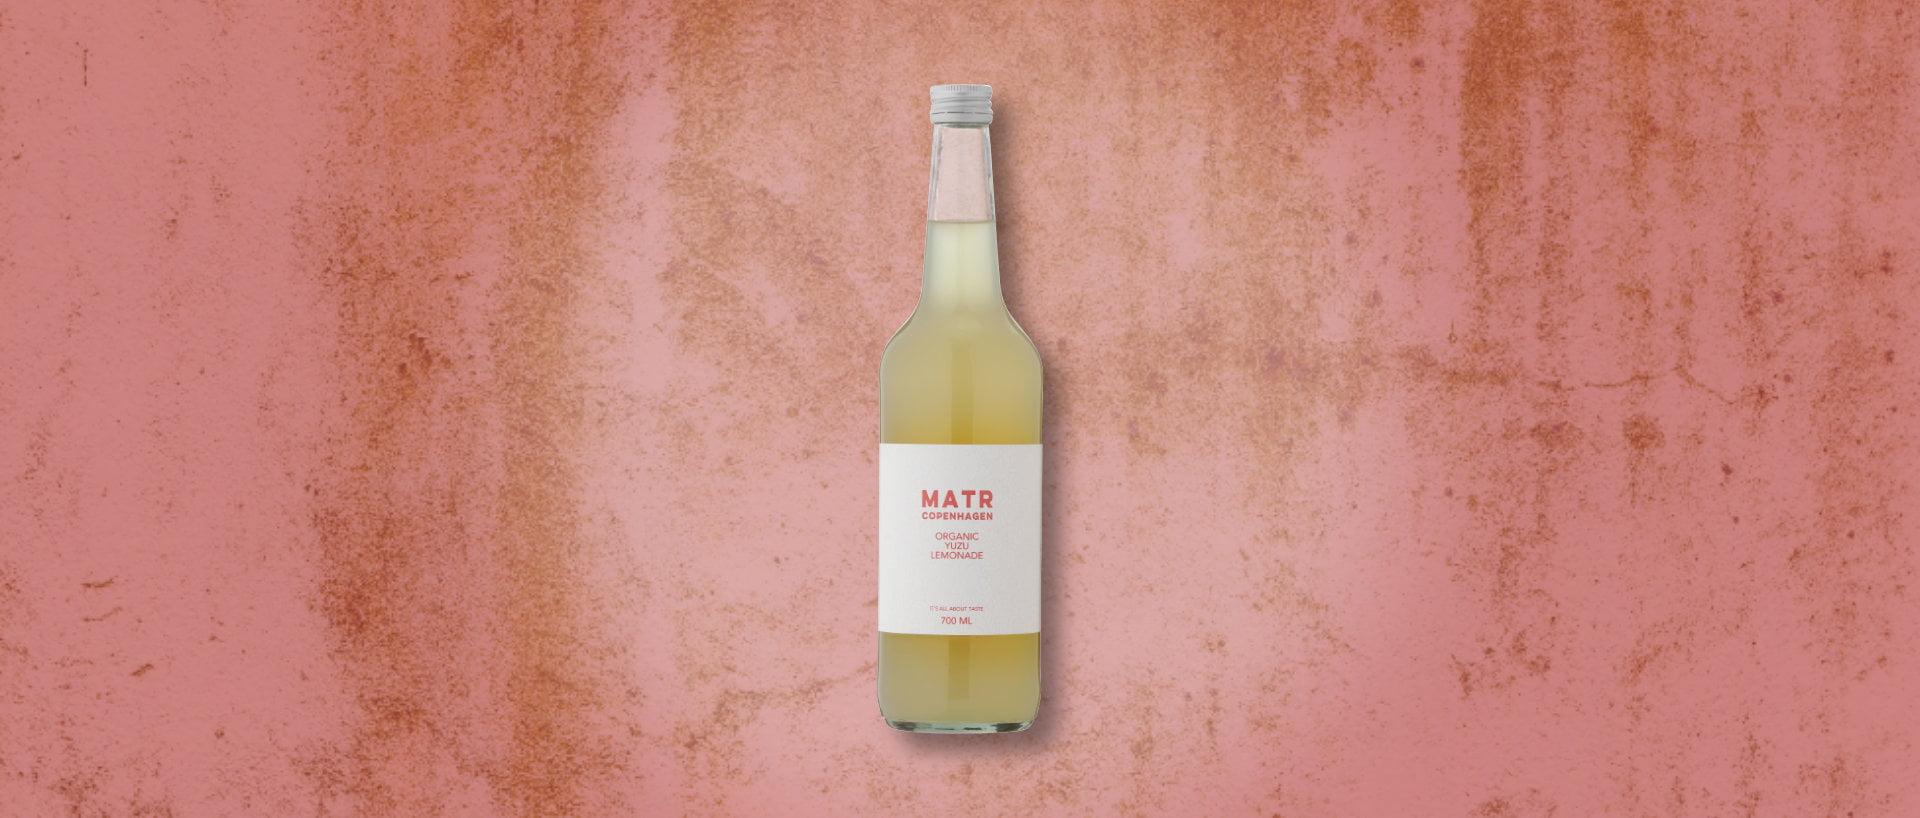 Organic Yuzu Lemonade in glass bottle